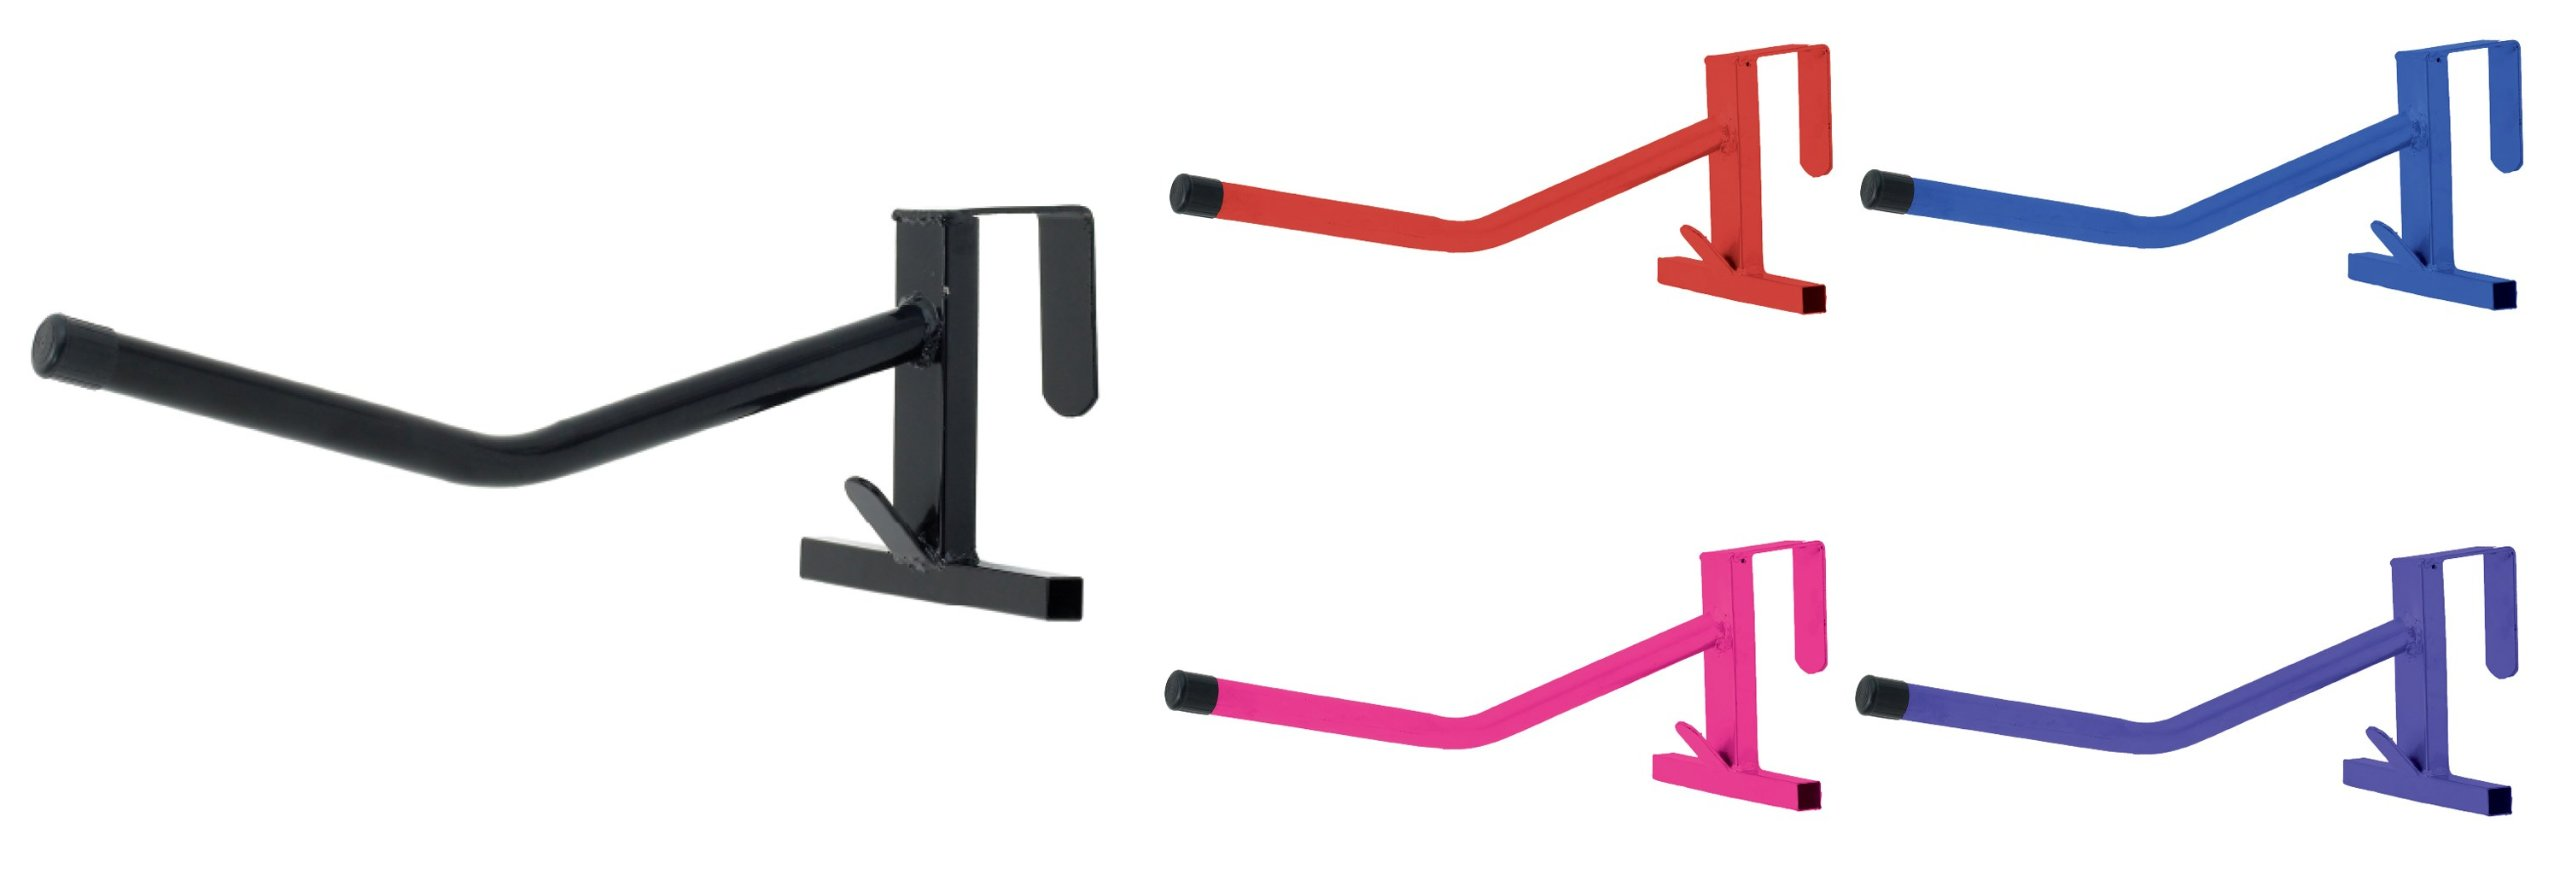 Portable Single Arm Saddle Rack - One Size - Black